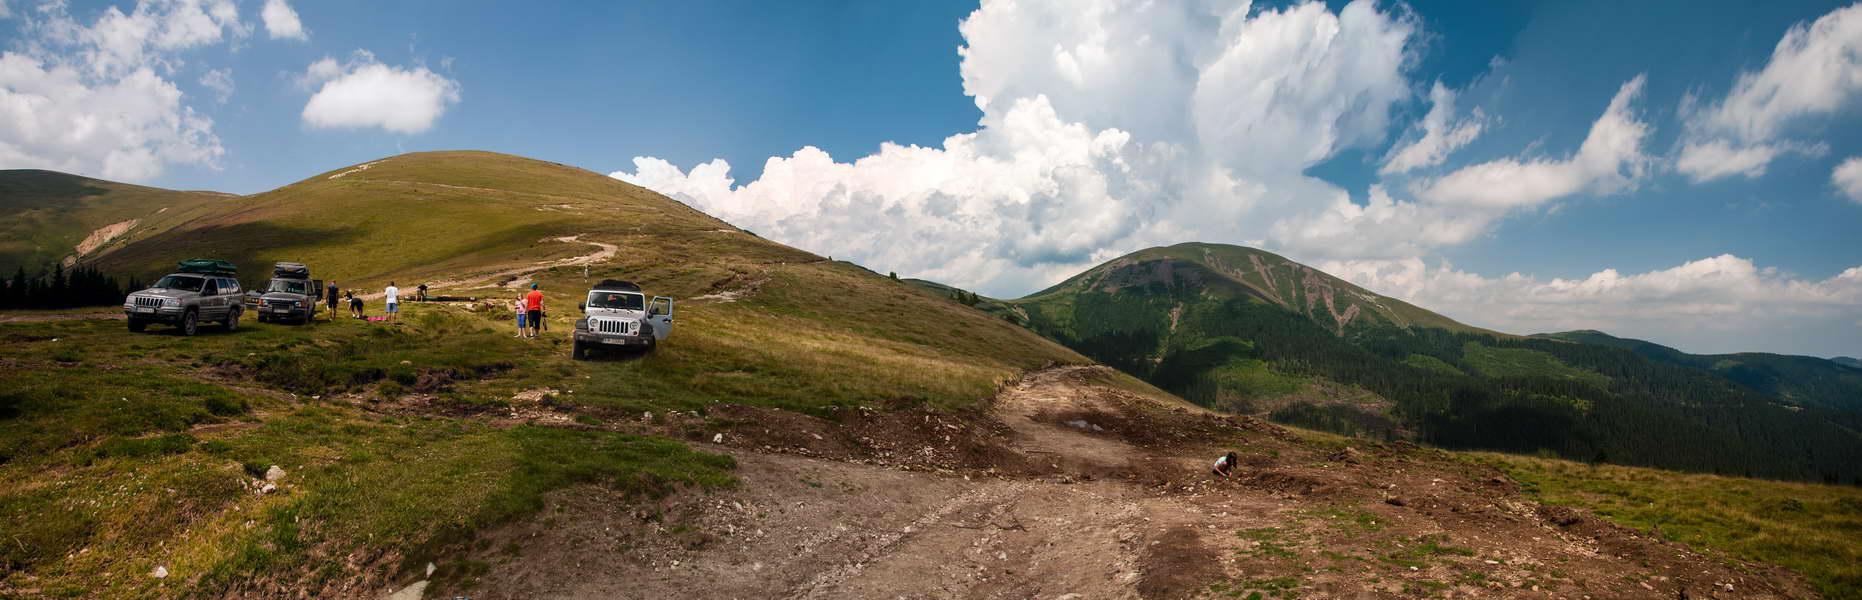 Rumunija_2015_220